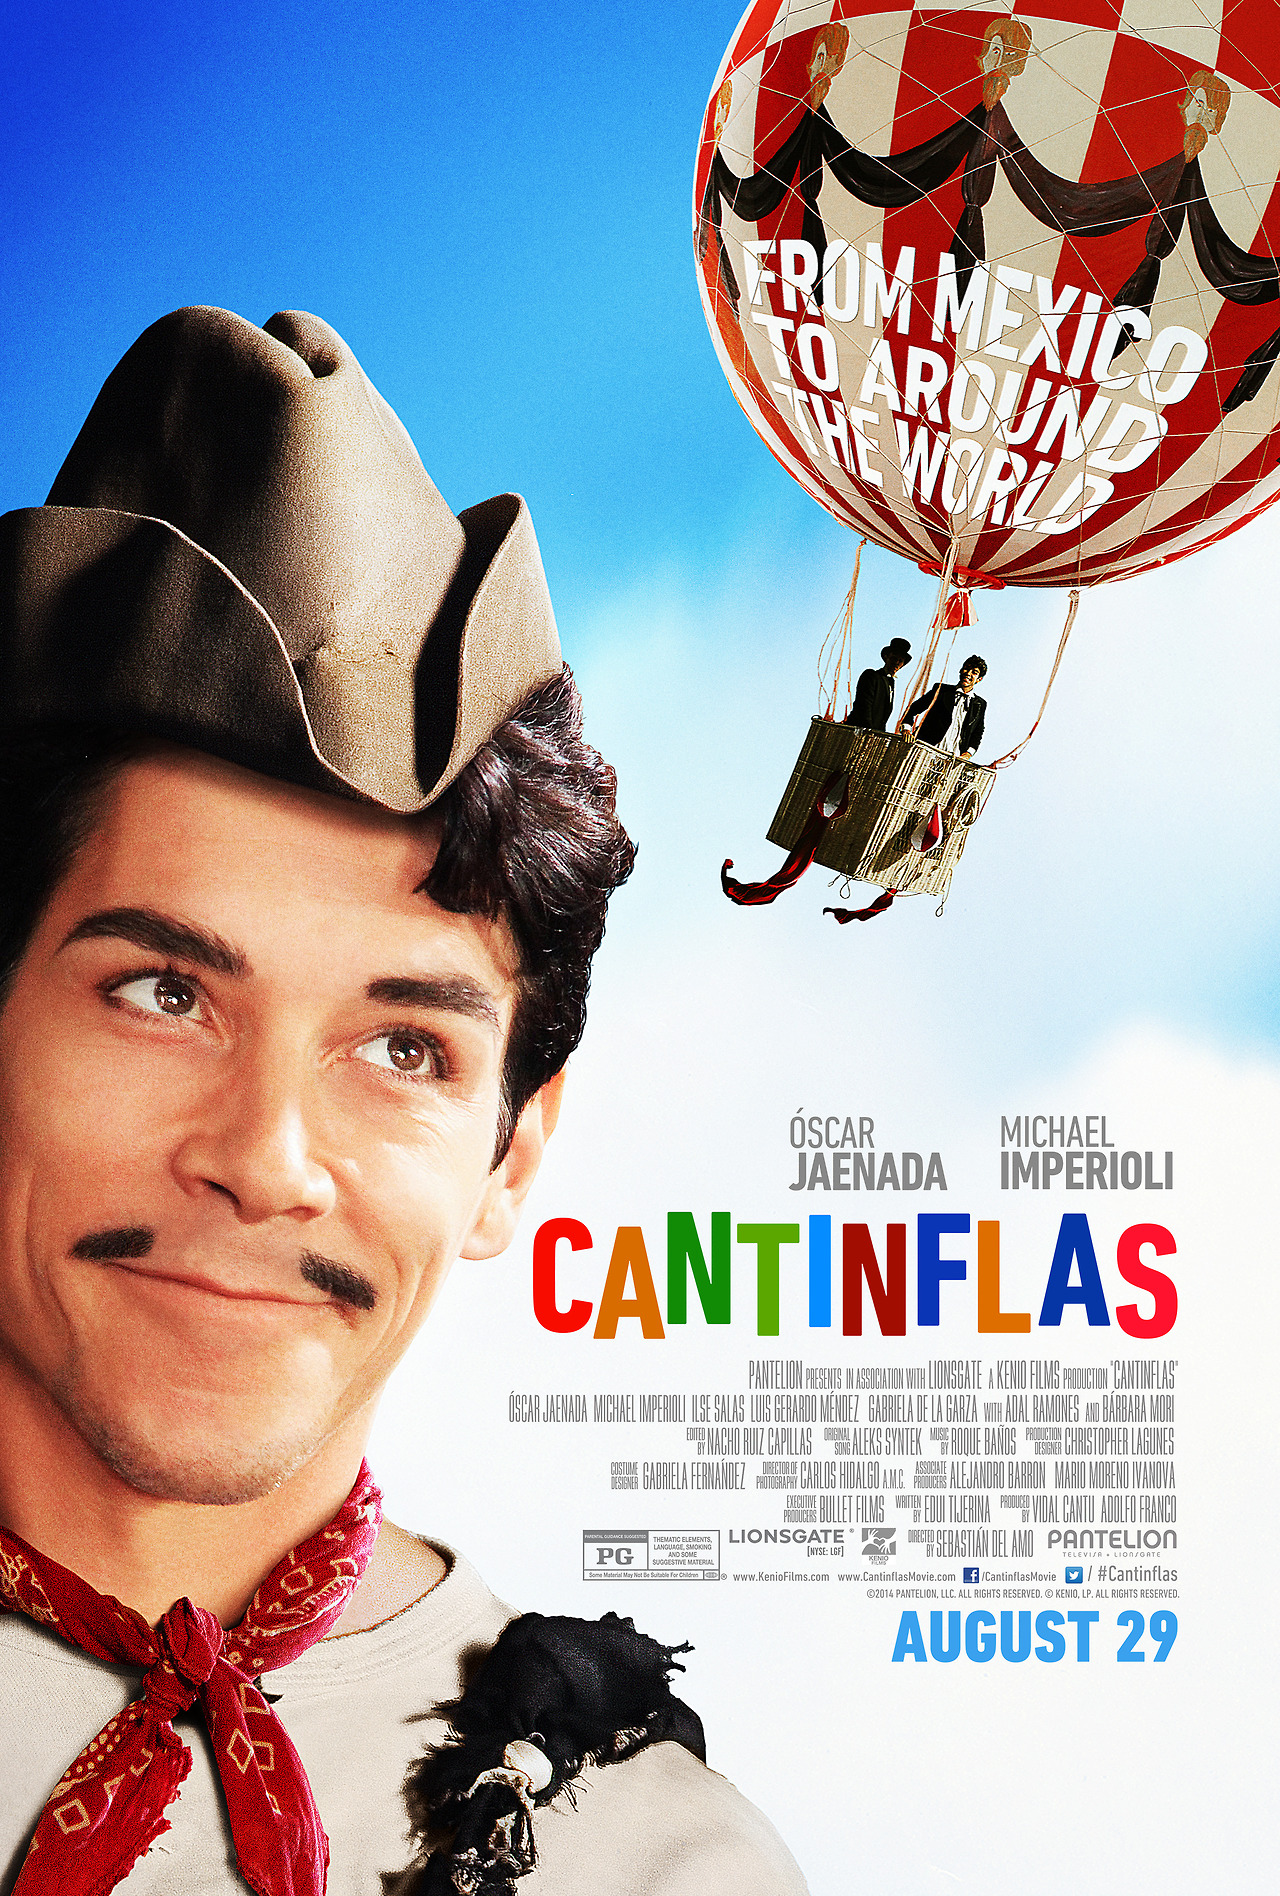 Courtesy of KenioFilms.com and Pantelion Films